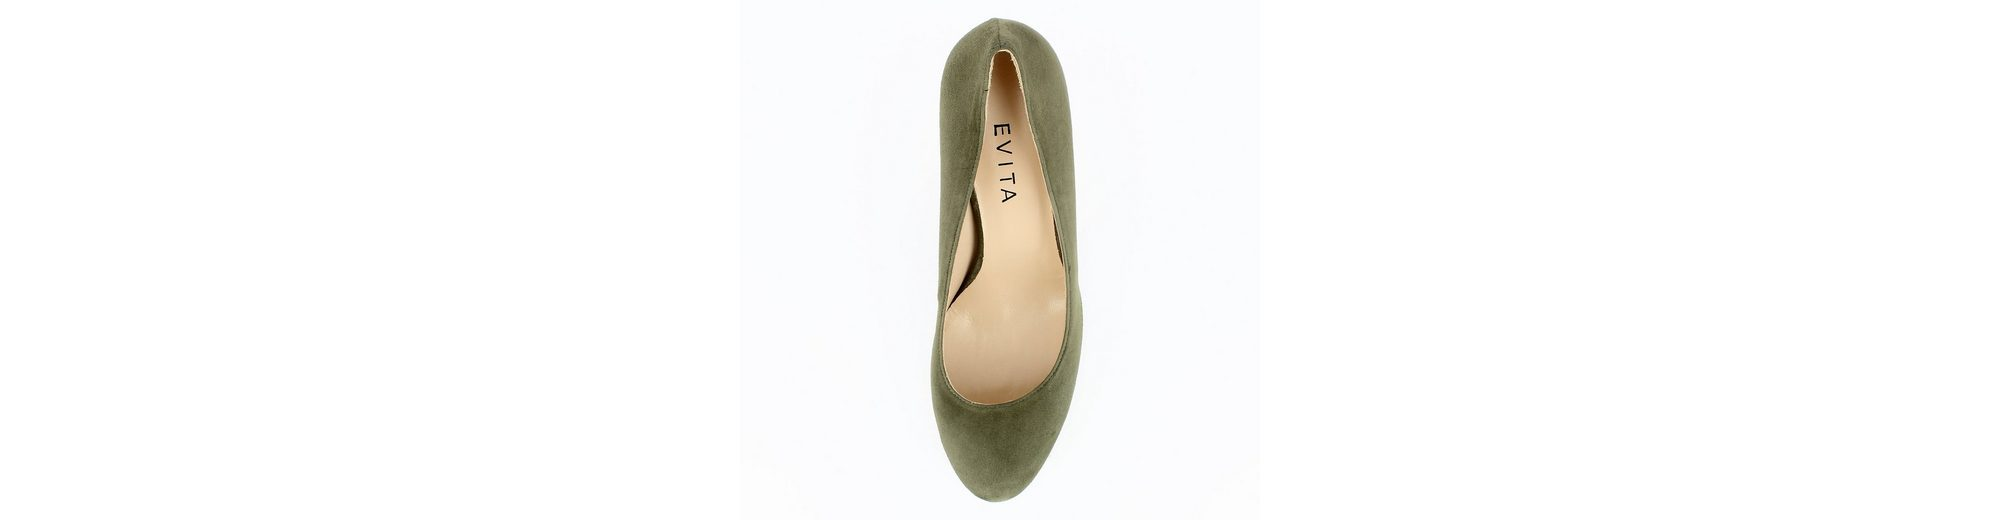 BIANCA Pumps BIANCA Evita Pumps Evita BIANCA Pumps Evita Evita BIANCA 1fC7tc6